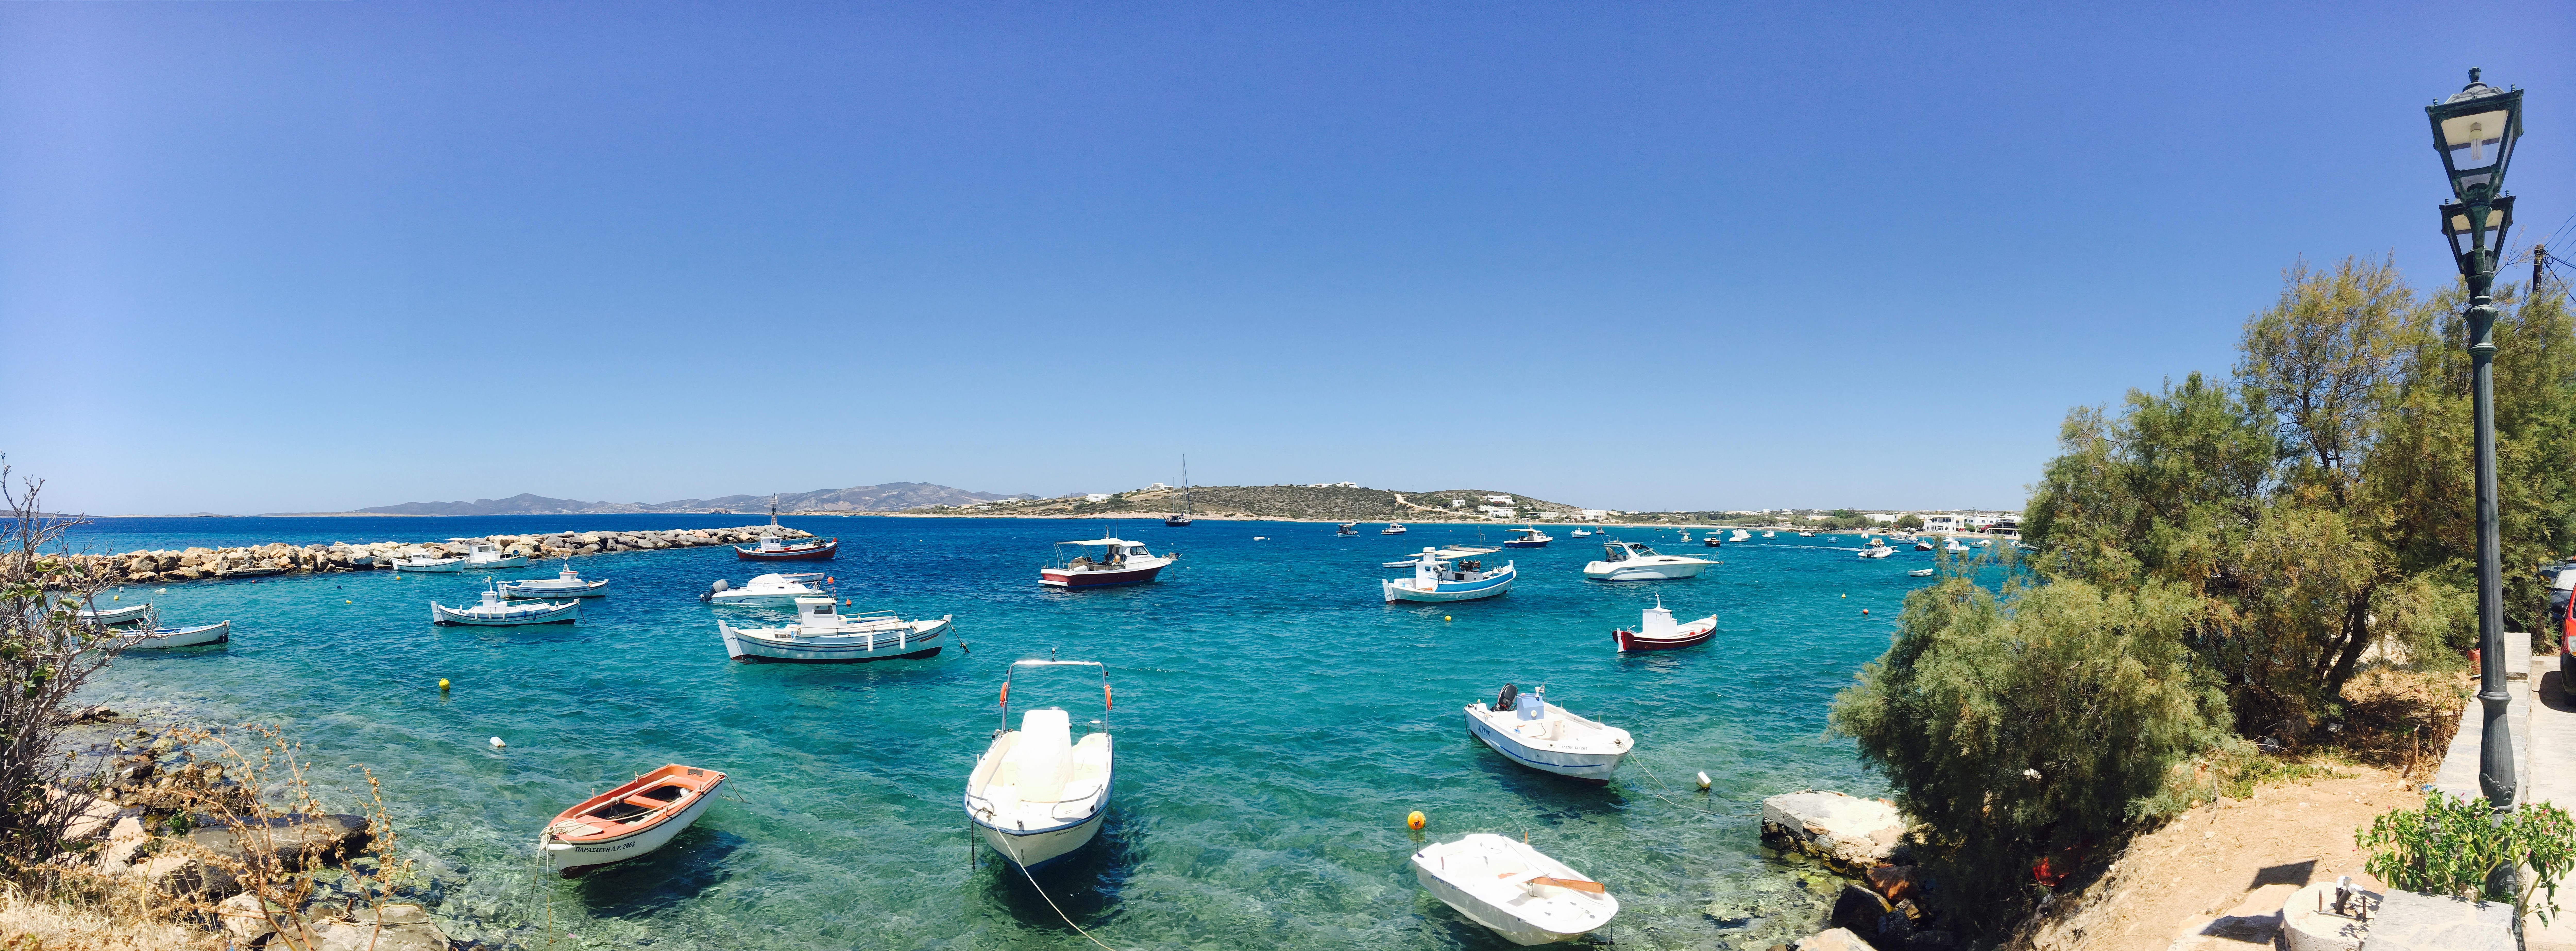 Port d'Alykis, Paros, Îles Cyclades